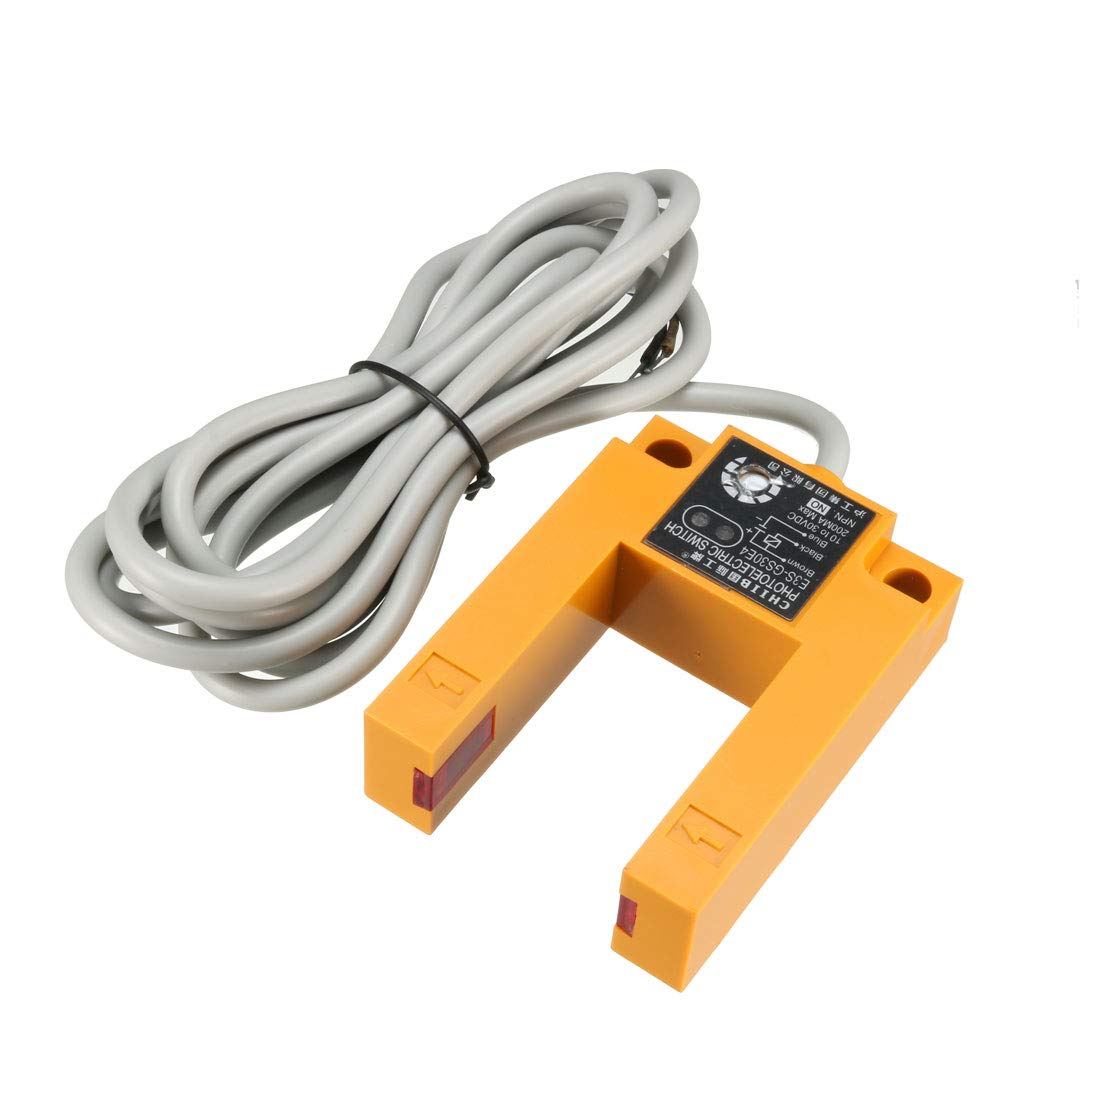 Dc 3 Wire 6 36v Pnp Ir Photoelectric Sensor Switch 30cm Proximity Wiring Diagram Further E18 B03p1 Home Improvement